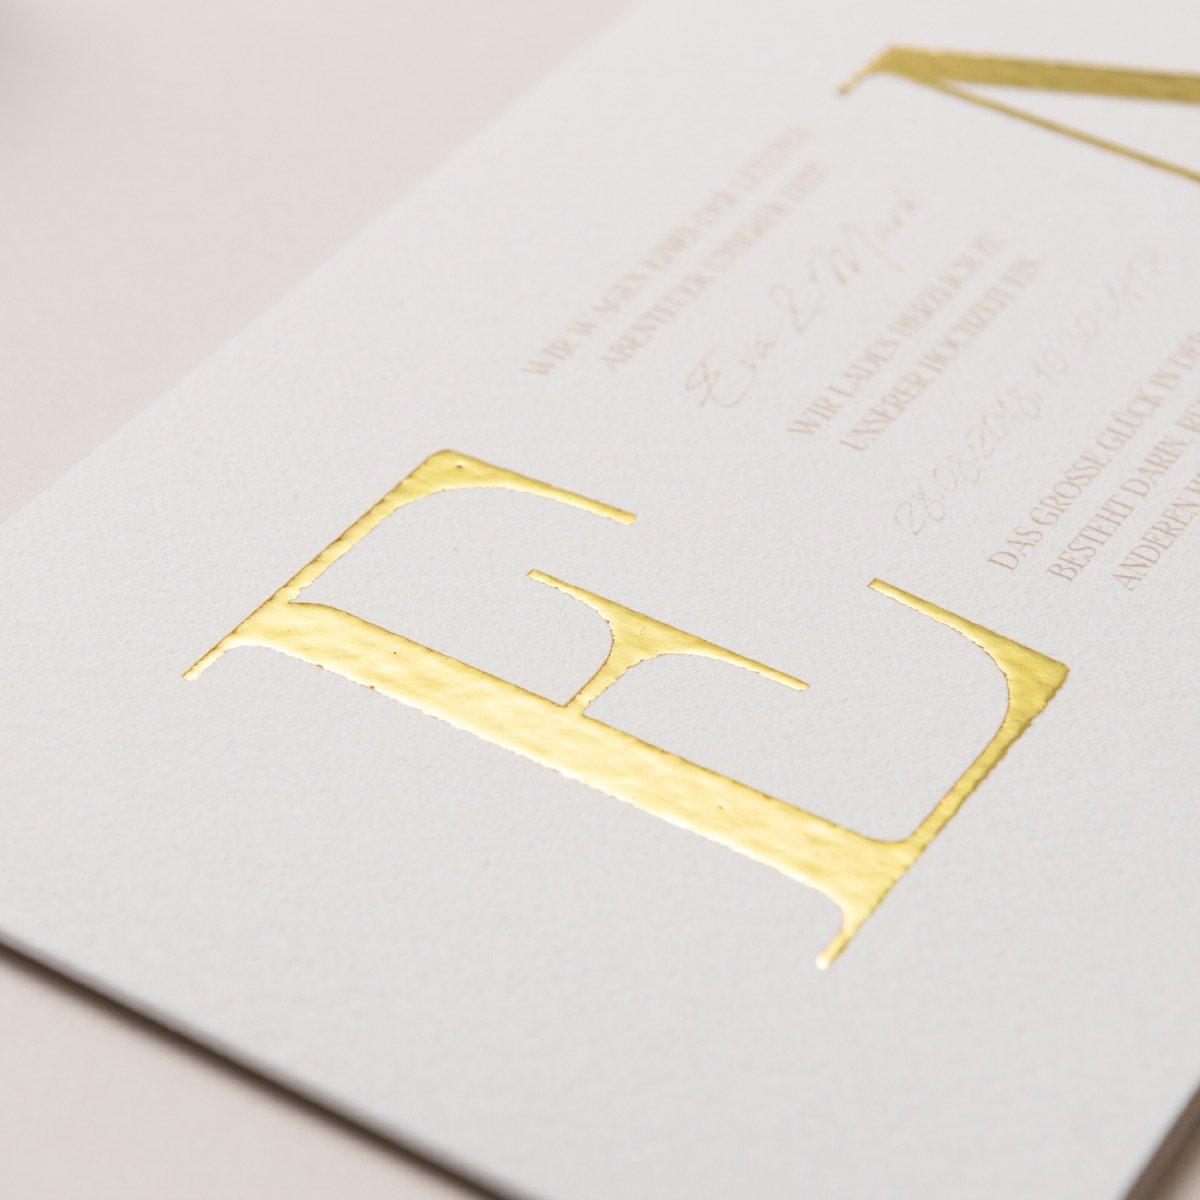 Papelle Golddruck - Glamourös